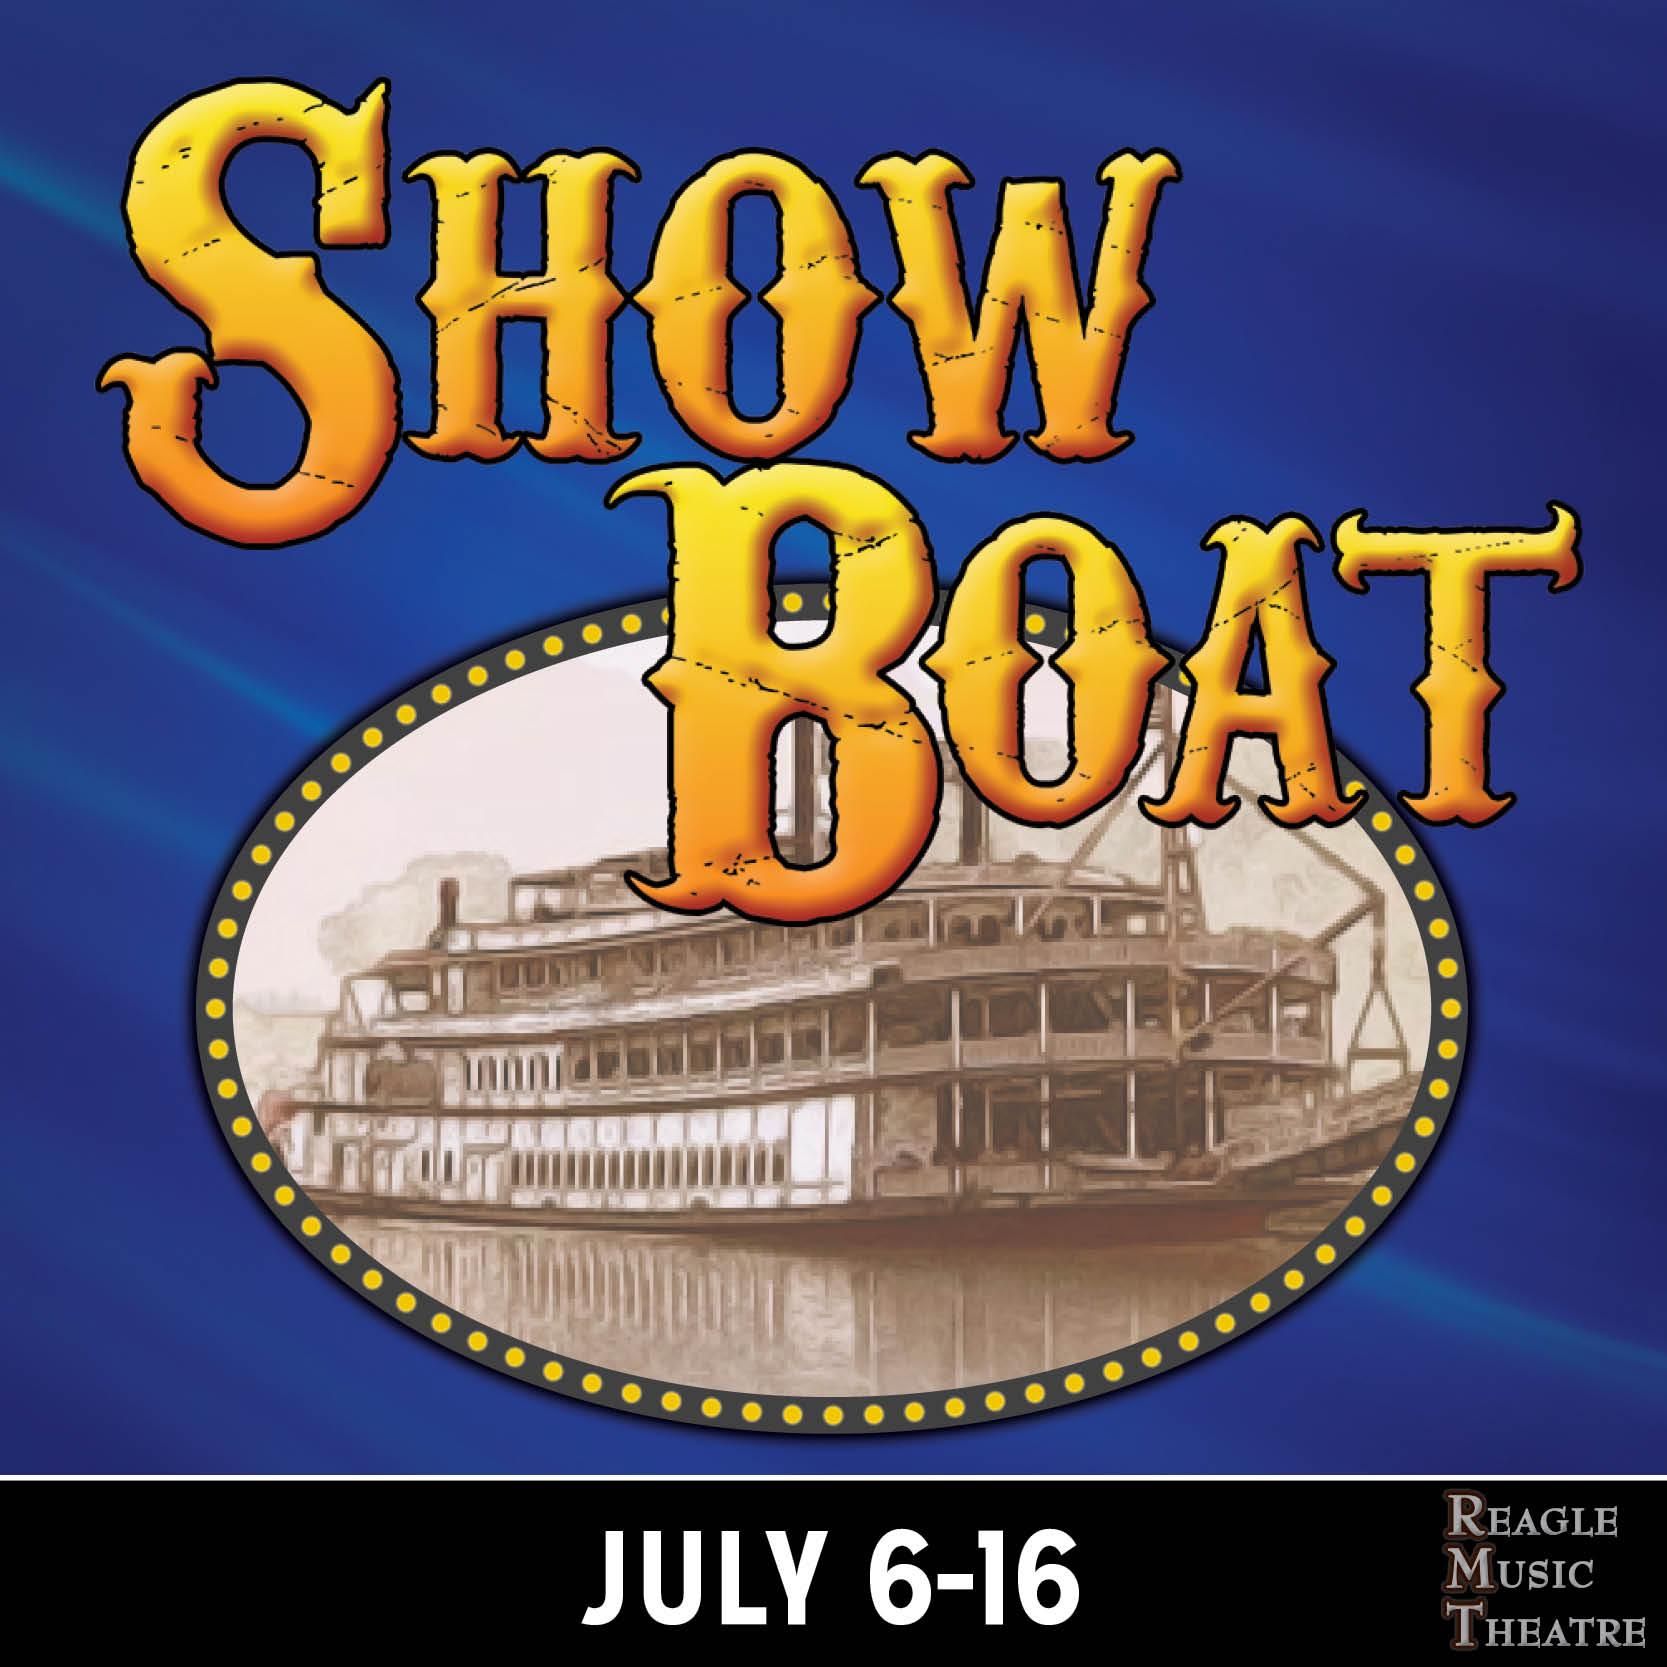 Reagle Showboat